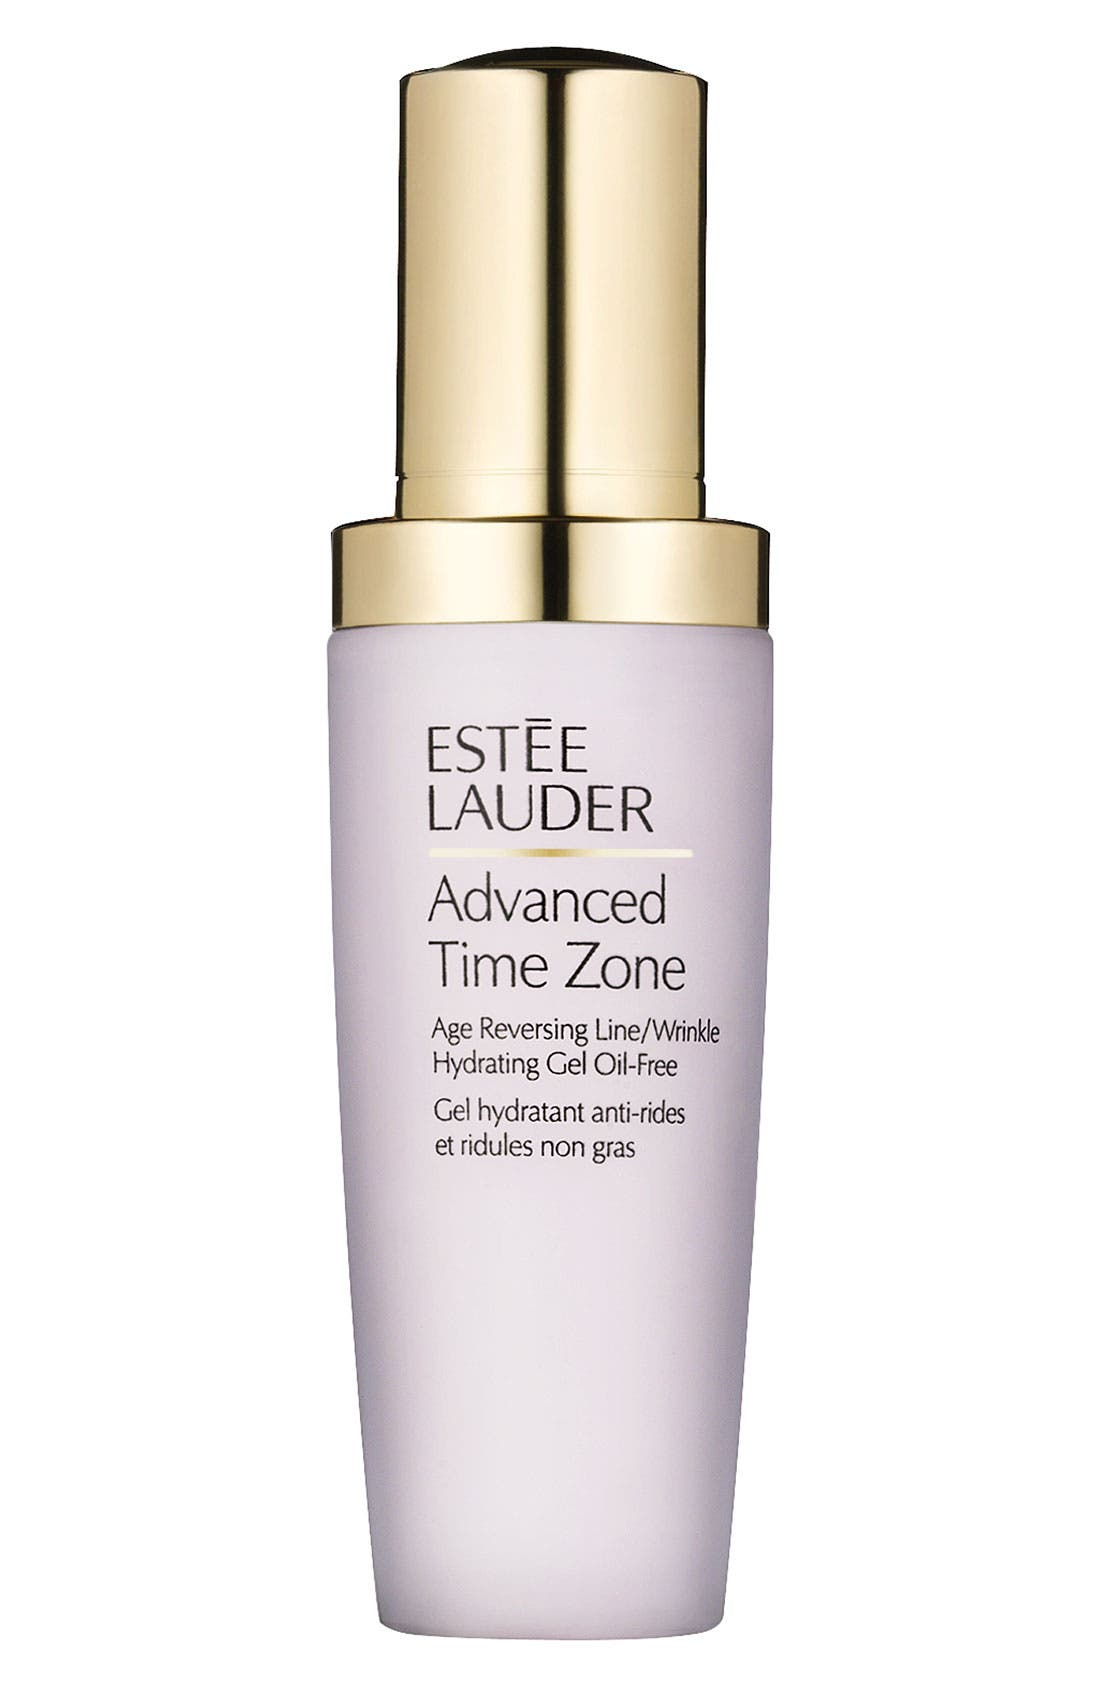 Estée Lauder Advanced Time Zone Age Reversing Line/Wrinkle Hydrating Gel